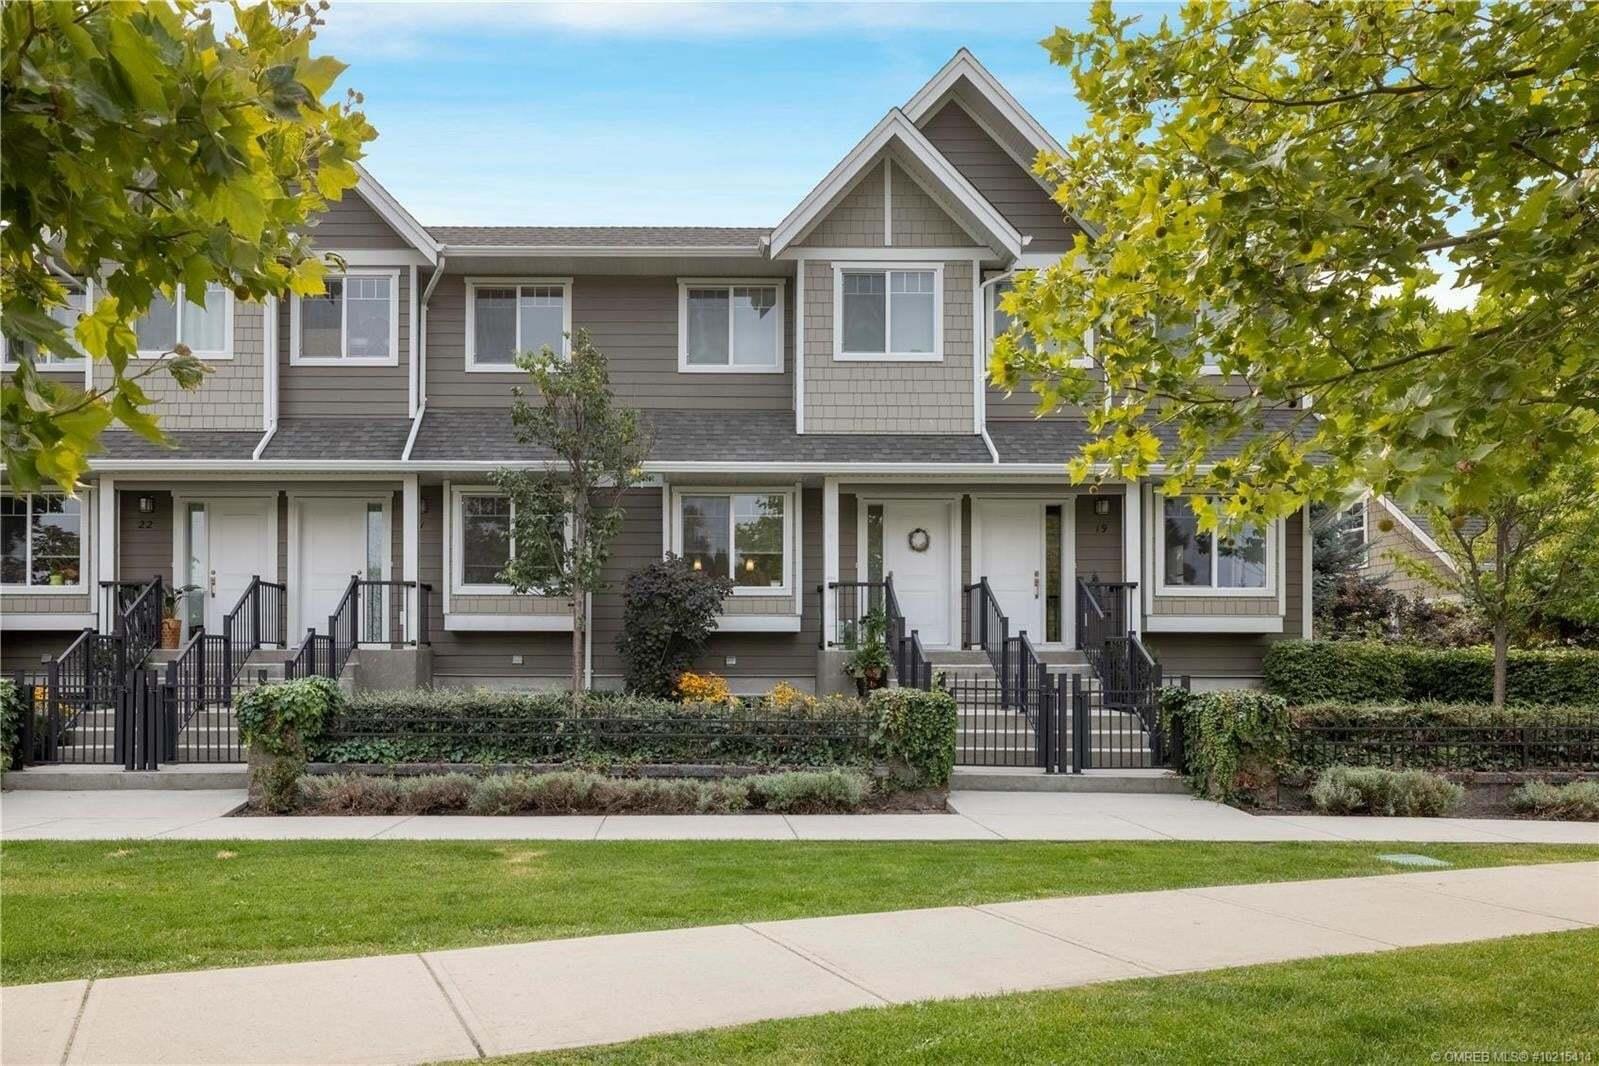 Townhouse for sale at 600 Sherwood Rd Kelowna British Columbia - MLS: 10215414